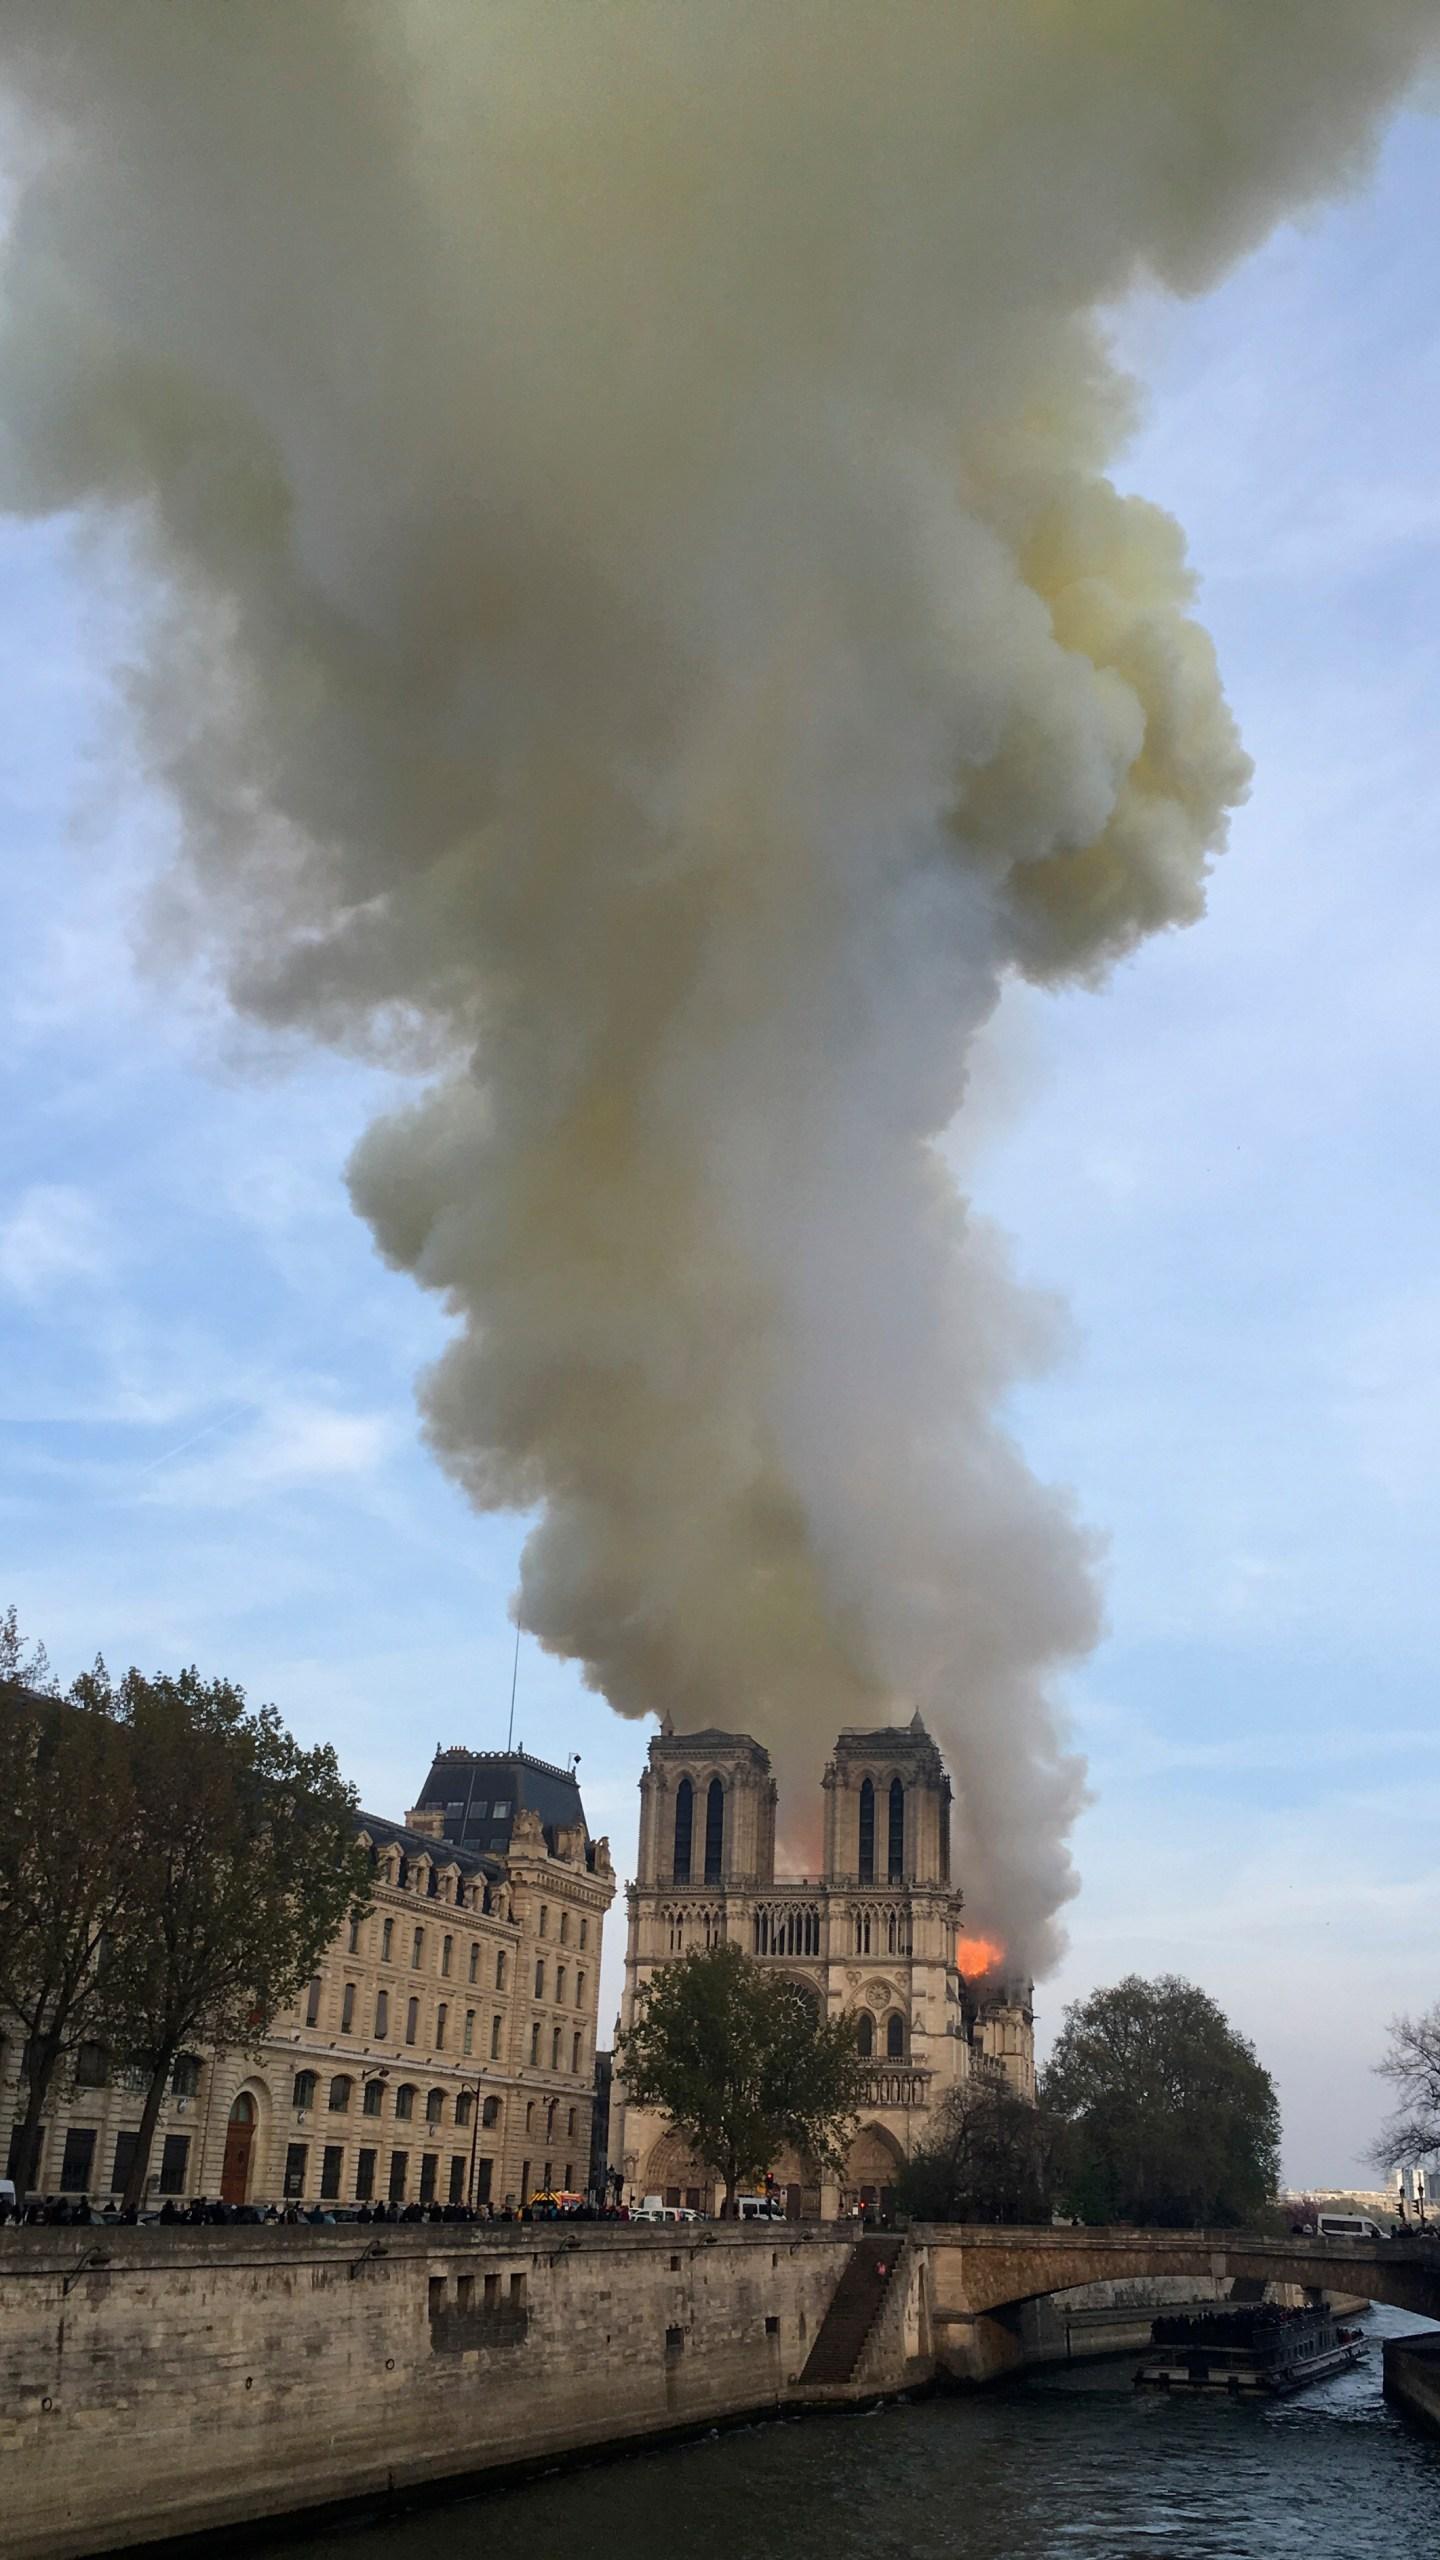 France_Notre_Dame_Fire_97124-159532.jpg23388896